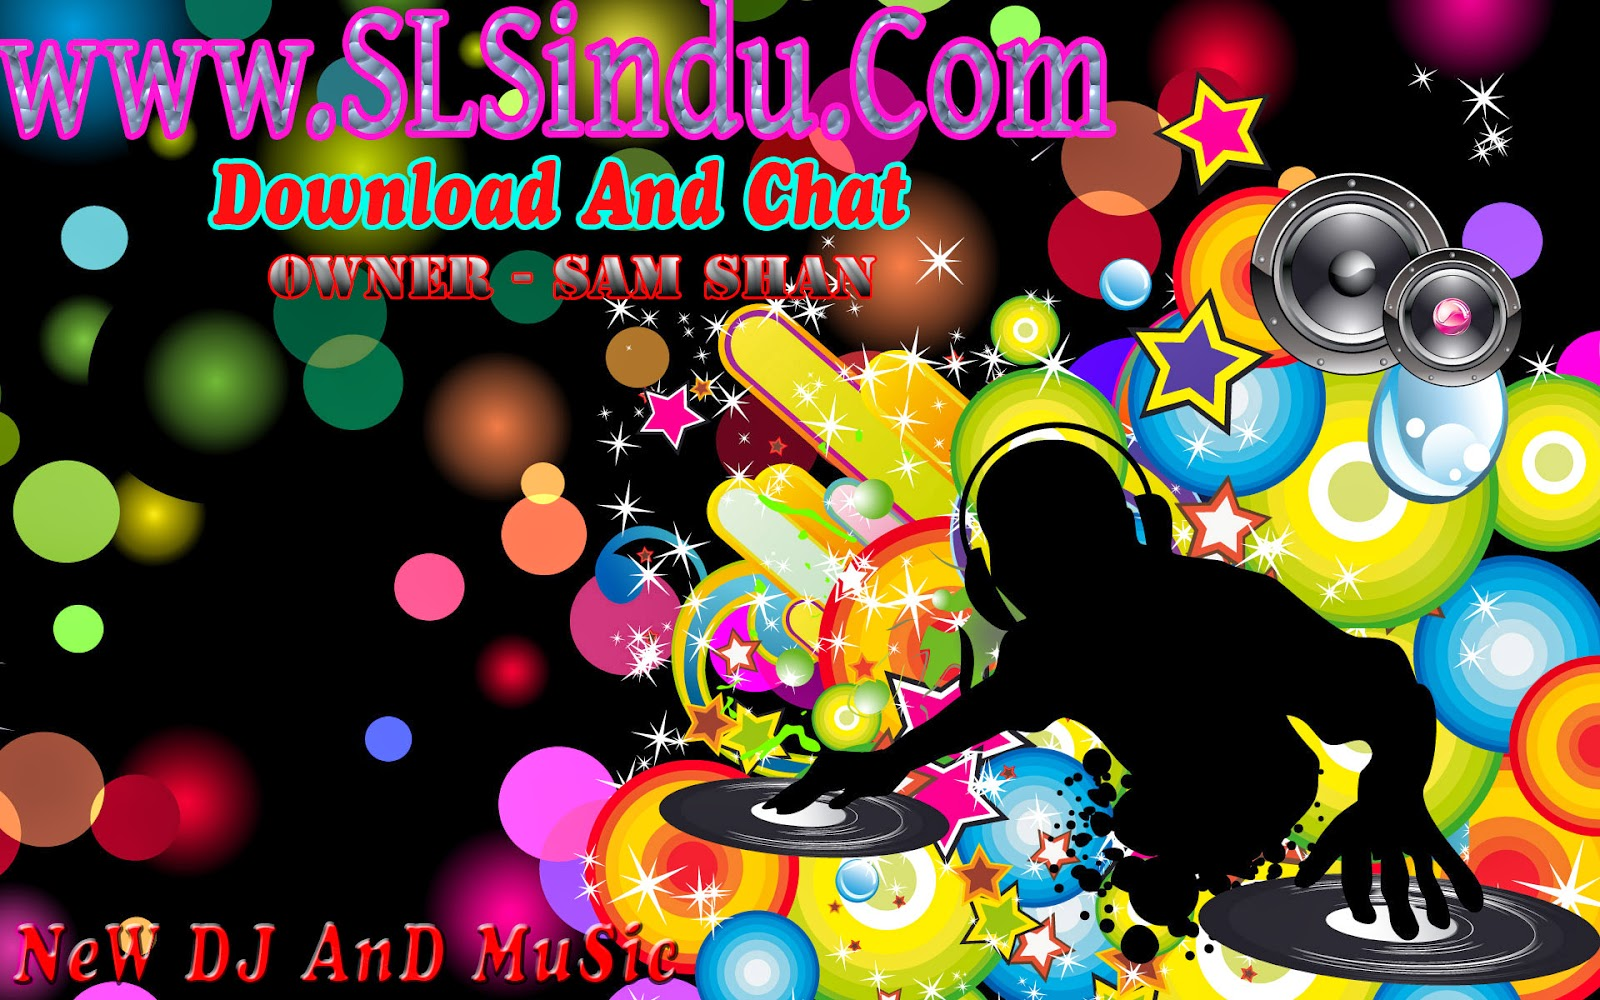 slnewsong blogspot com Best Downlaod Site: Duka Thada Karan